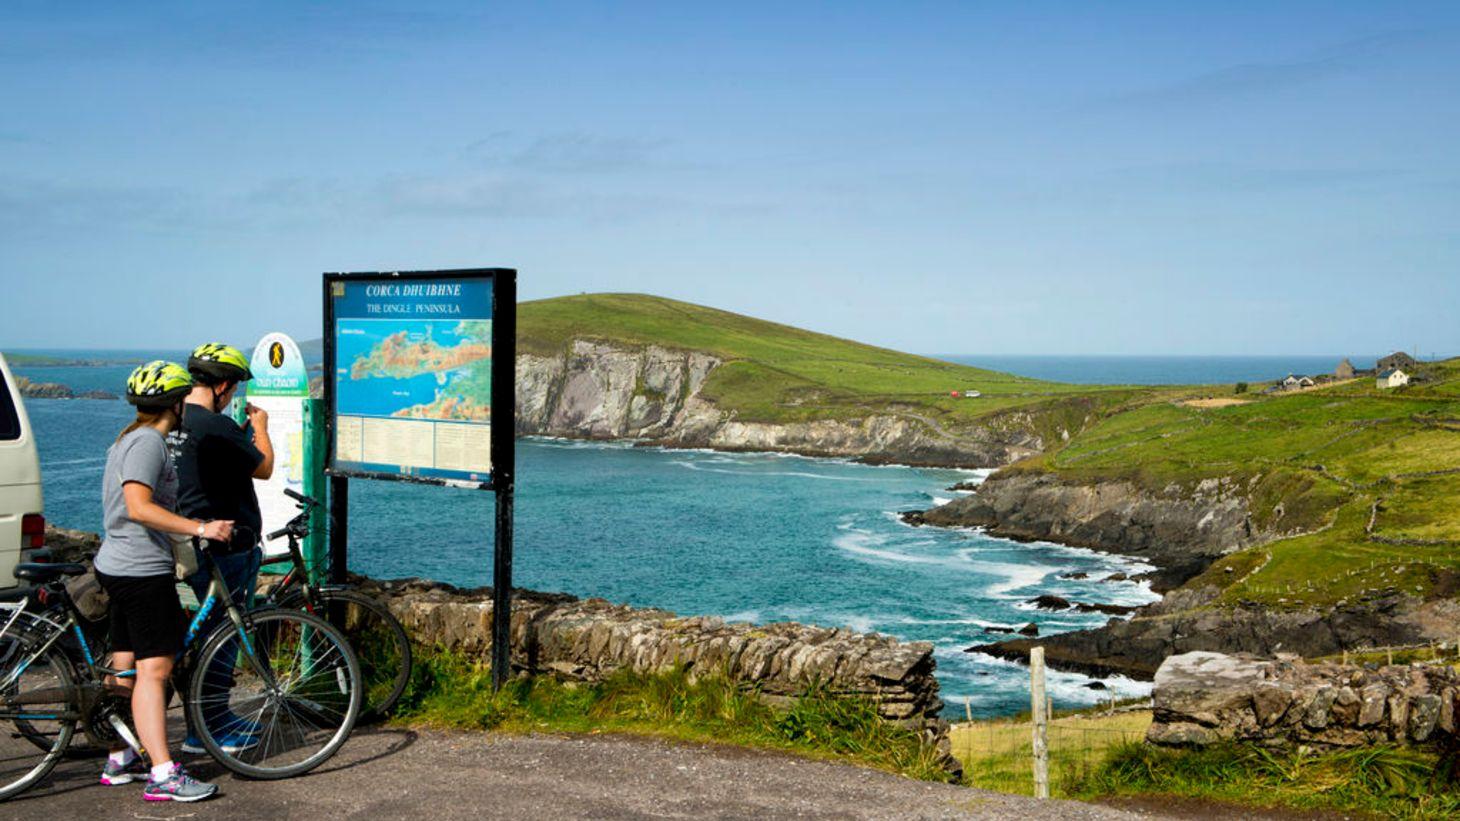 Explore the beautiful Slea Head by car or bike.